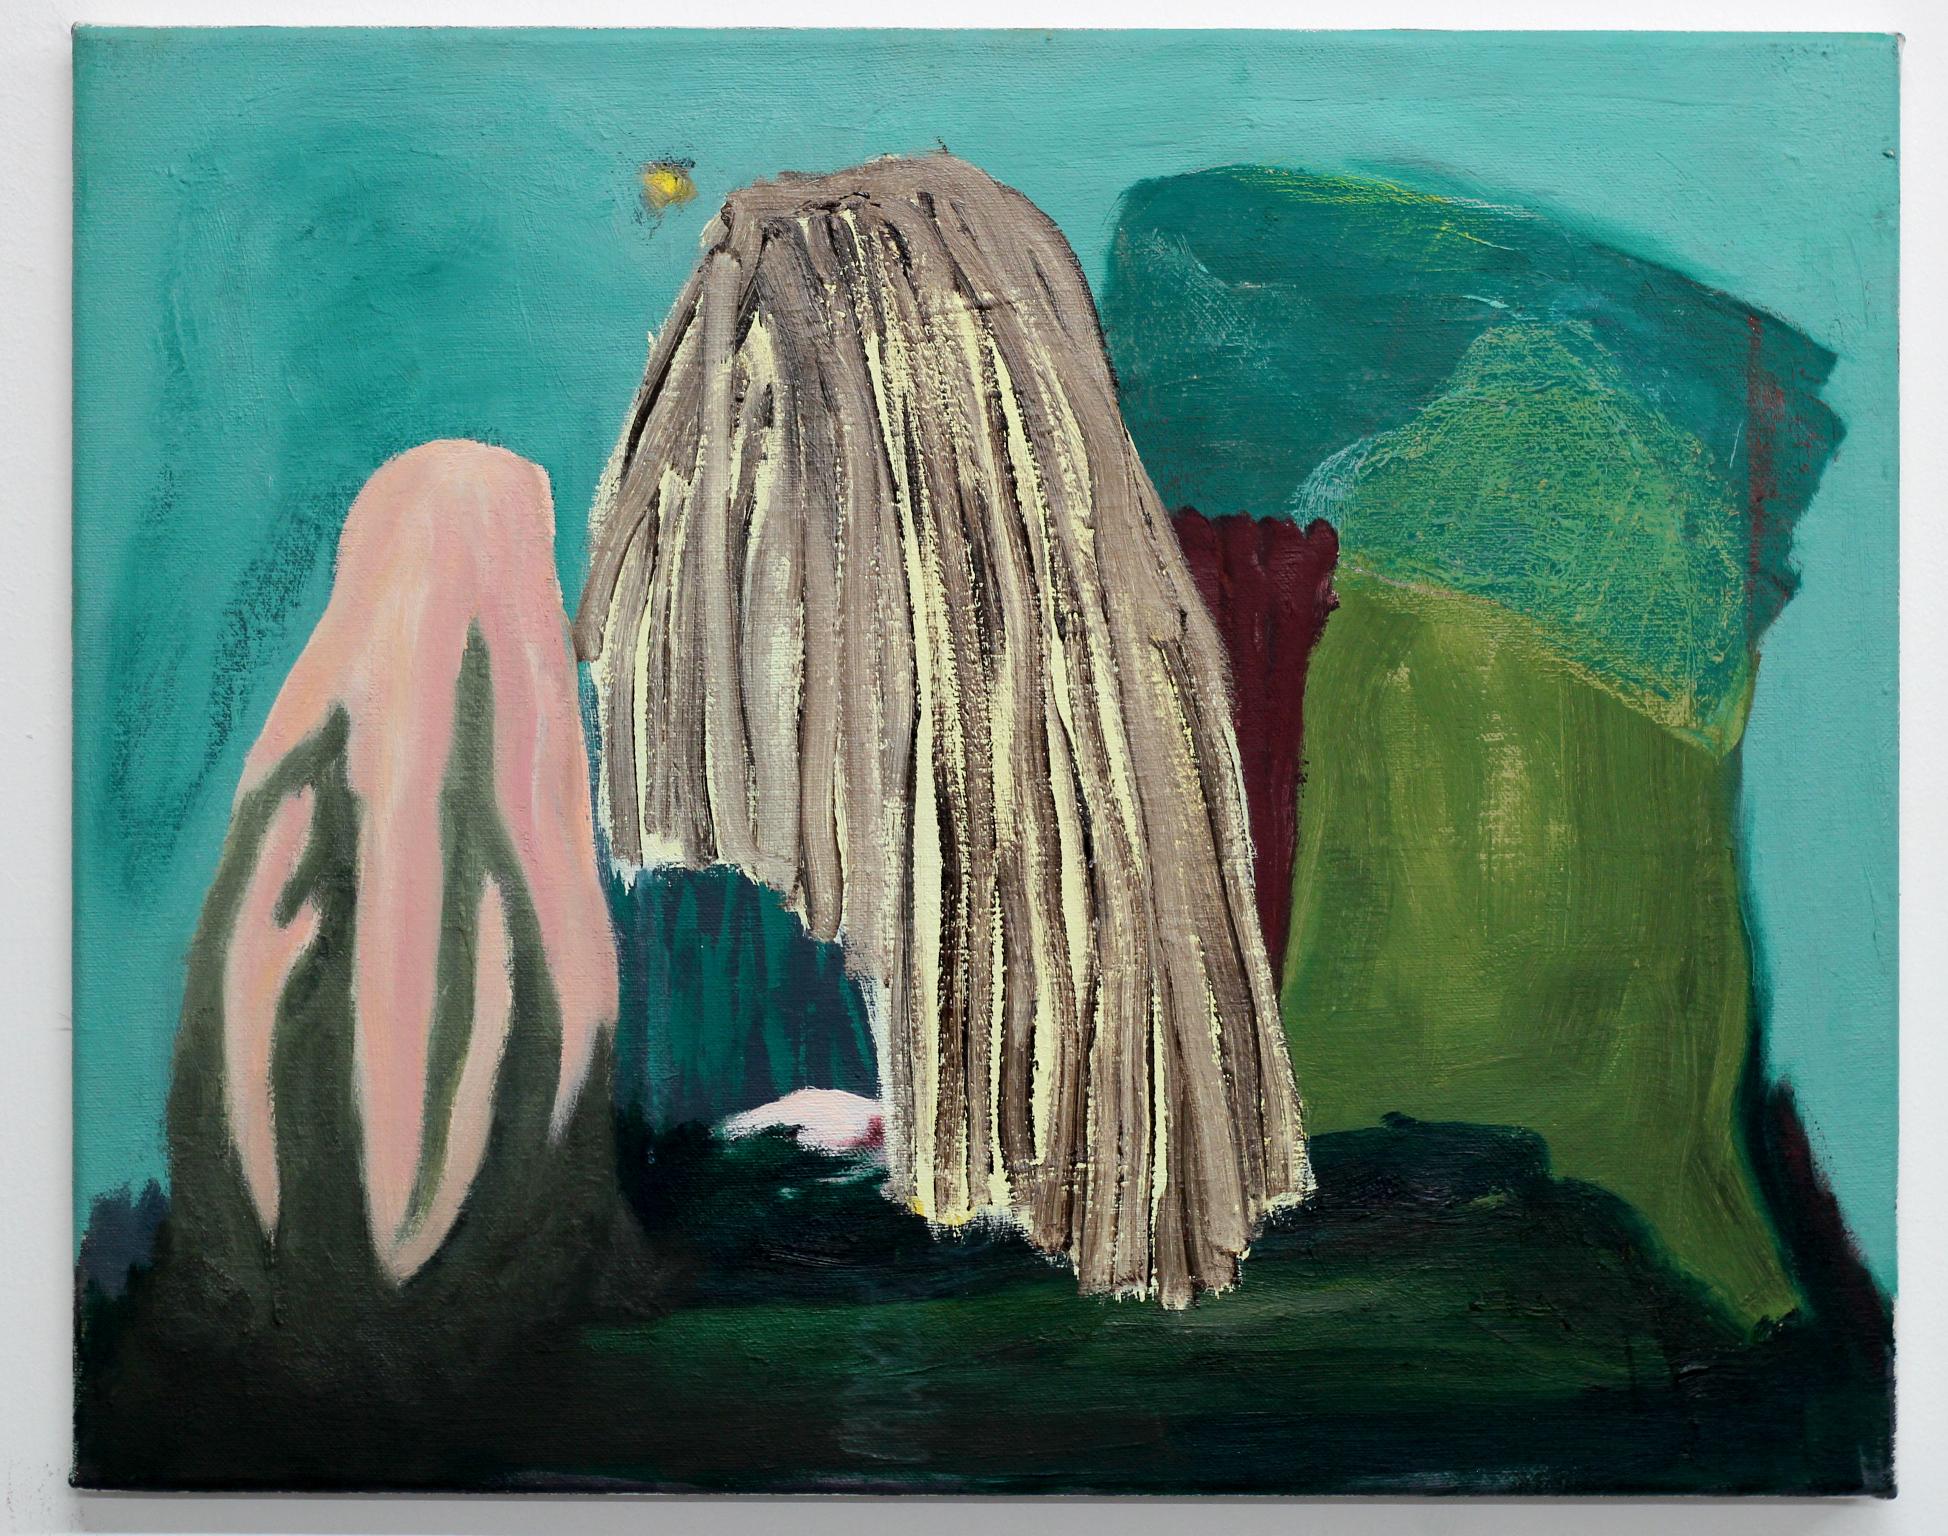 Veronika Hilger, untitled, 2015, oil on canvas, 40 x 50 cm